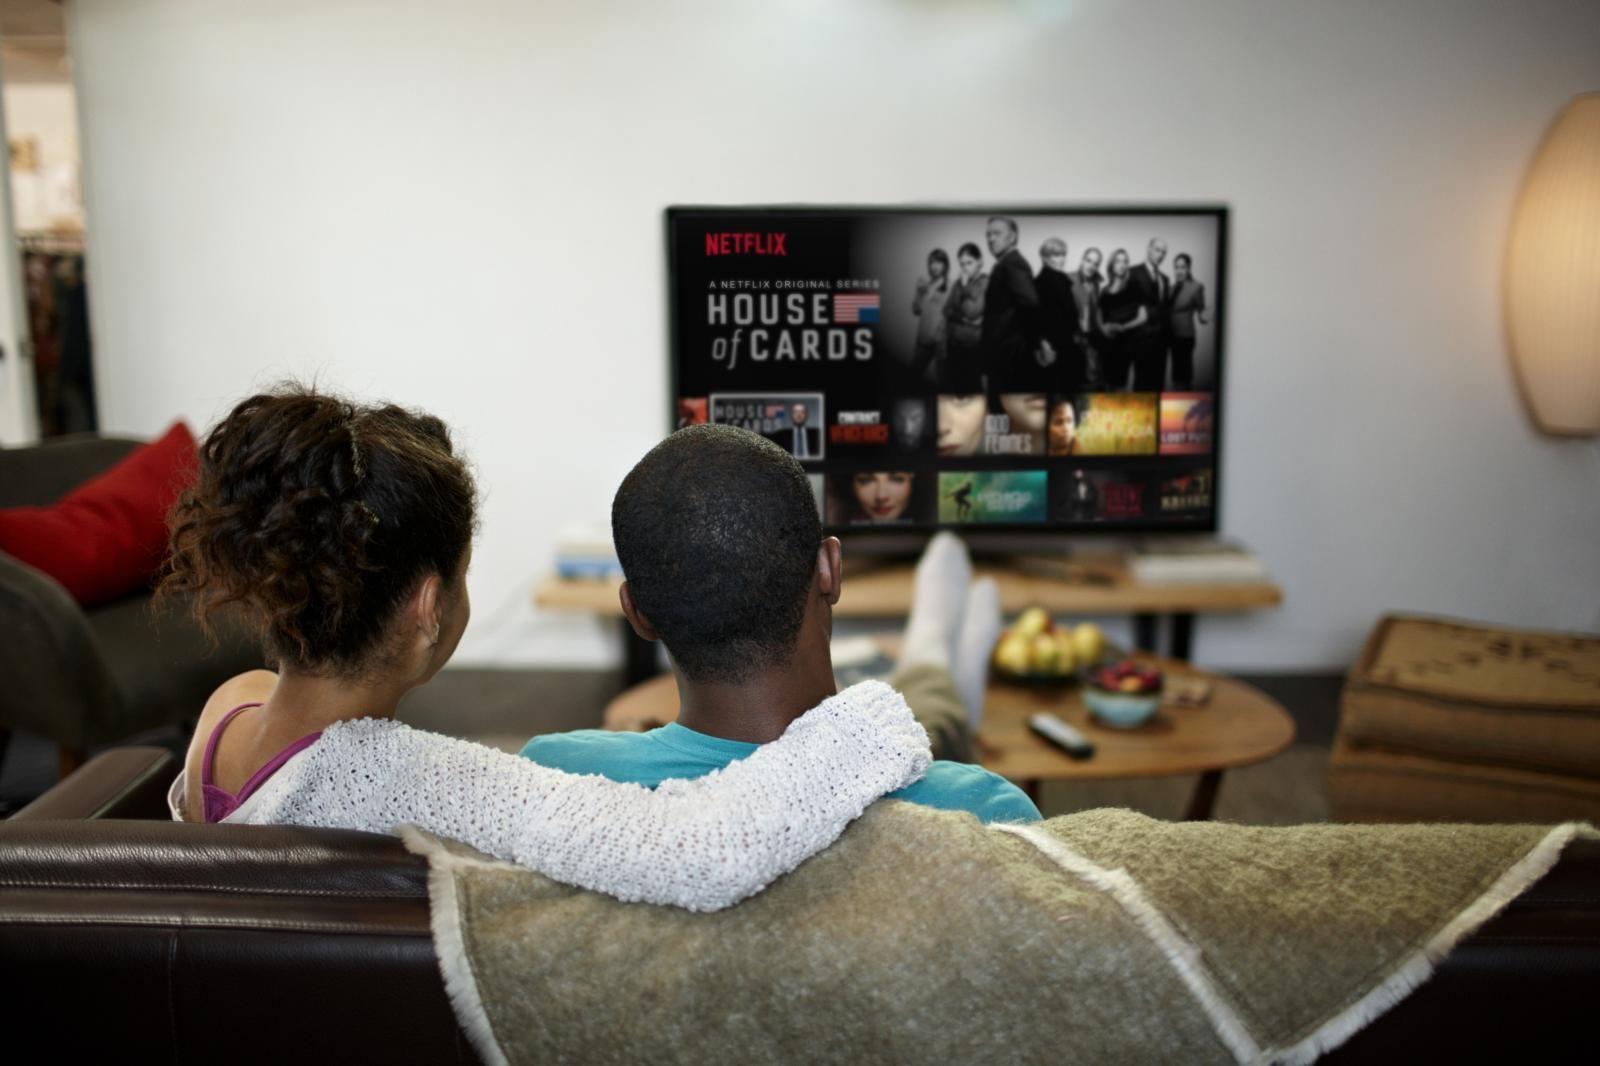 Google Pixel 3 with Google Home Hub Netflix, Netflix